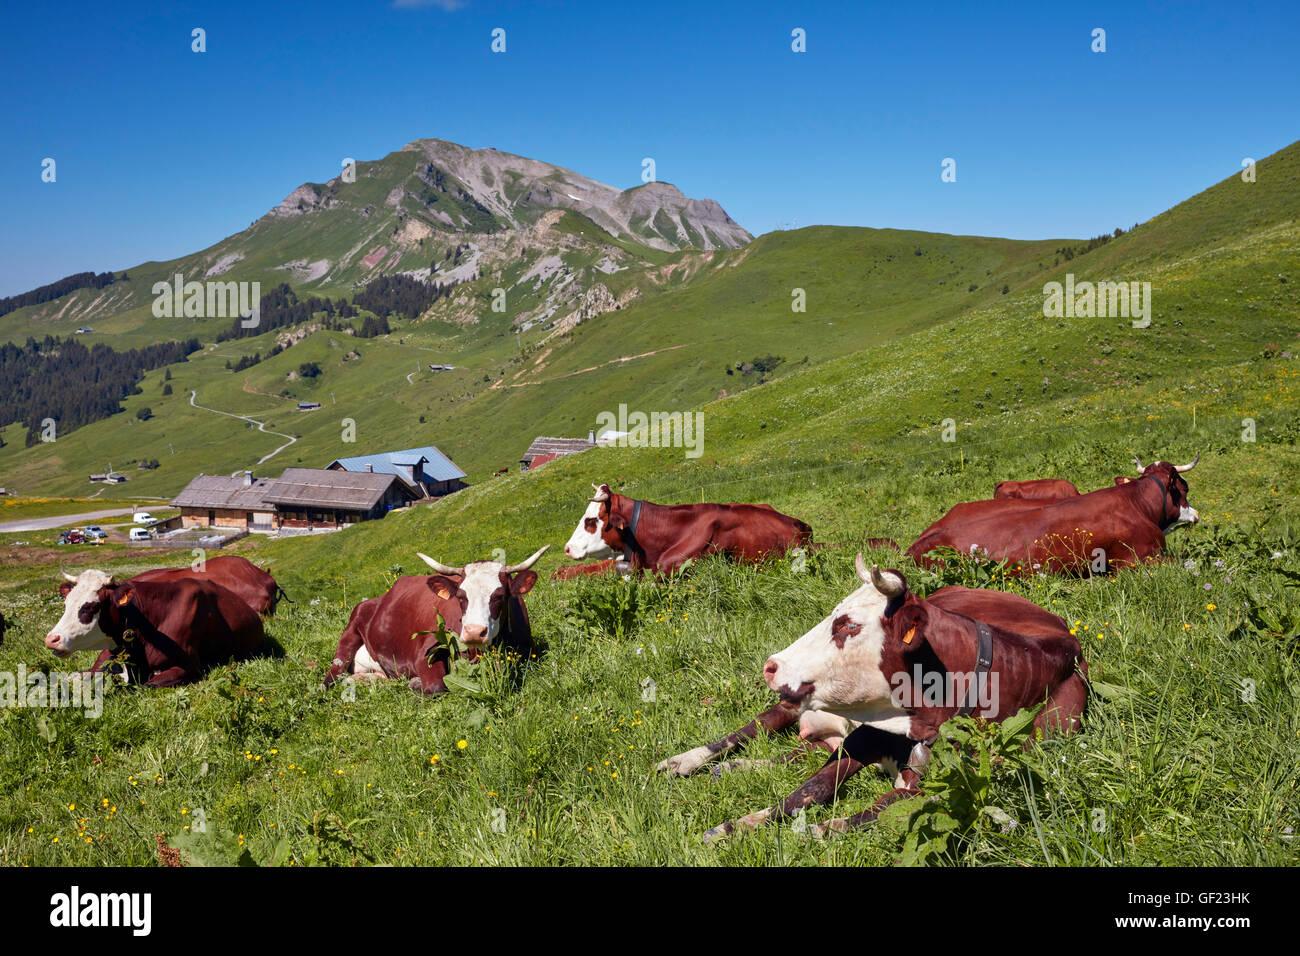 Abondance cows in meadow at Col des Annes. Le Grand Bornand. Haute-Savoie, France. - Stock Image